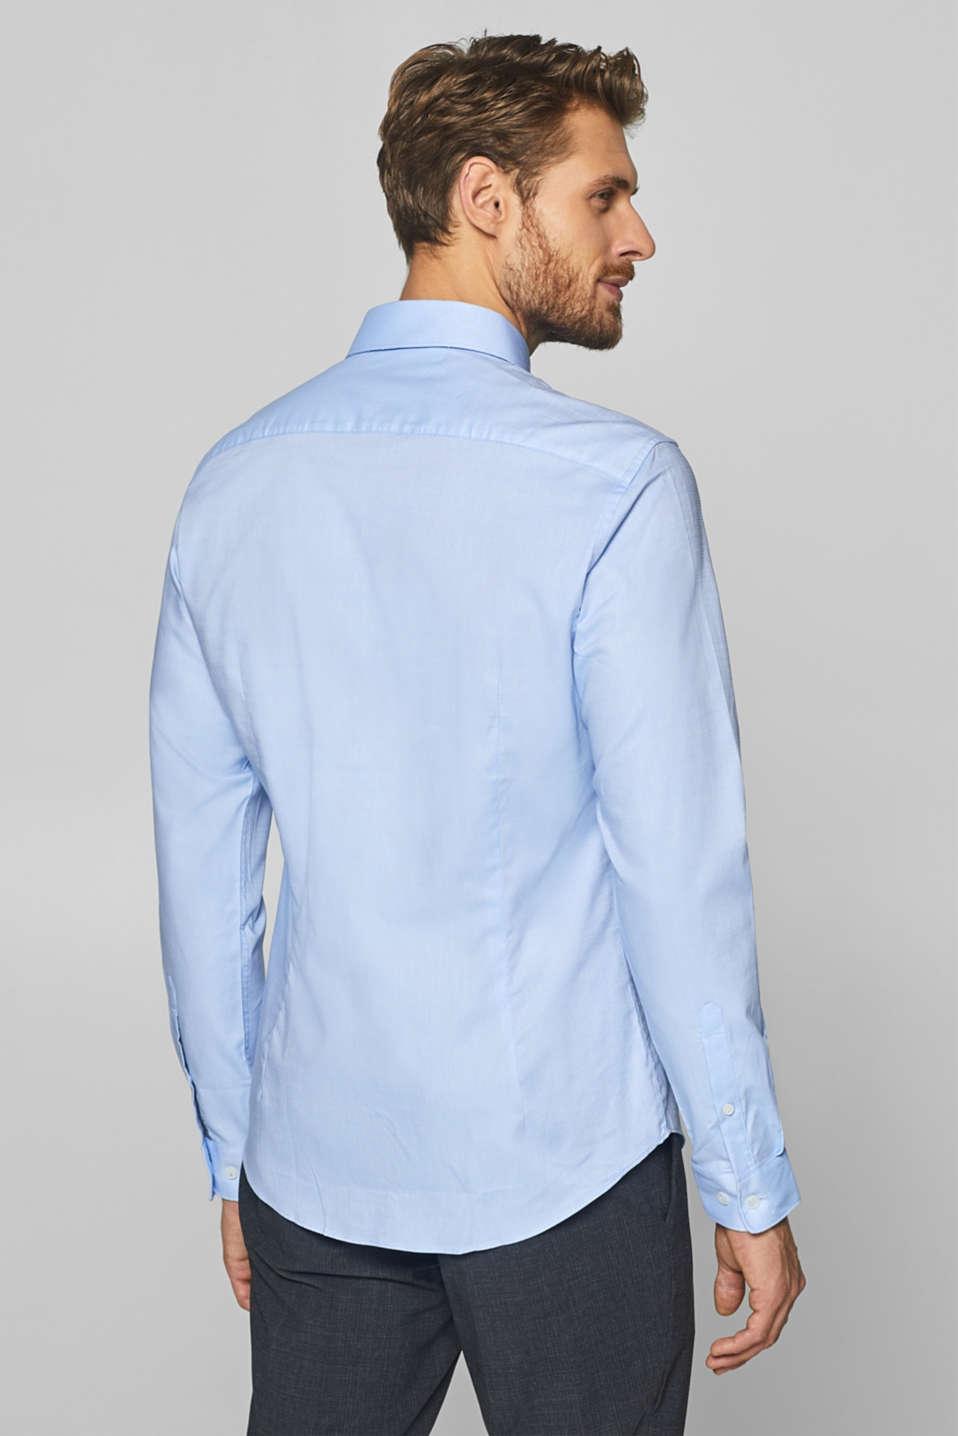 Shirts woven Slim fit, LIGHT BLUE, detail image number 3